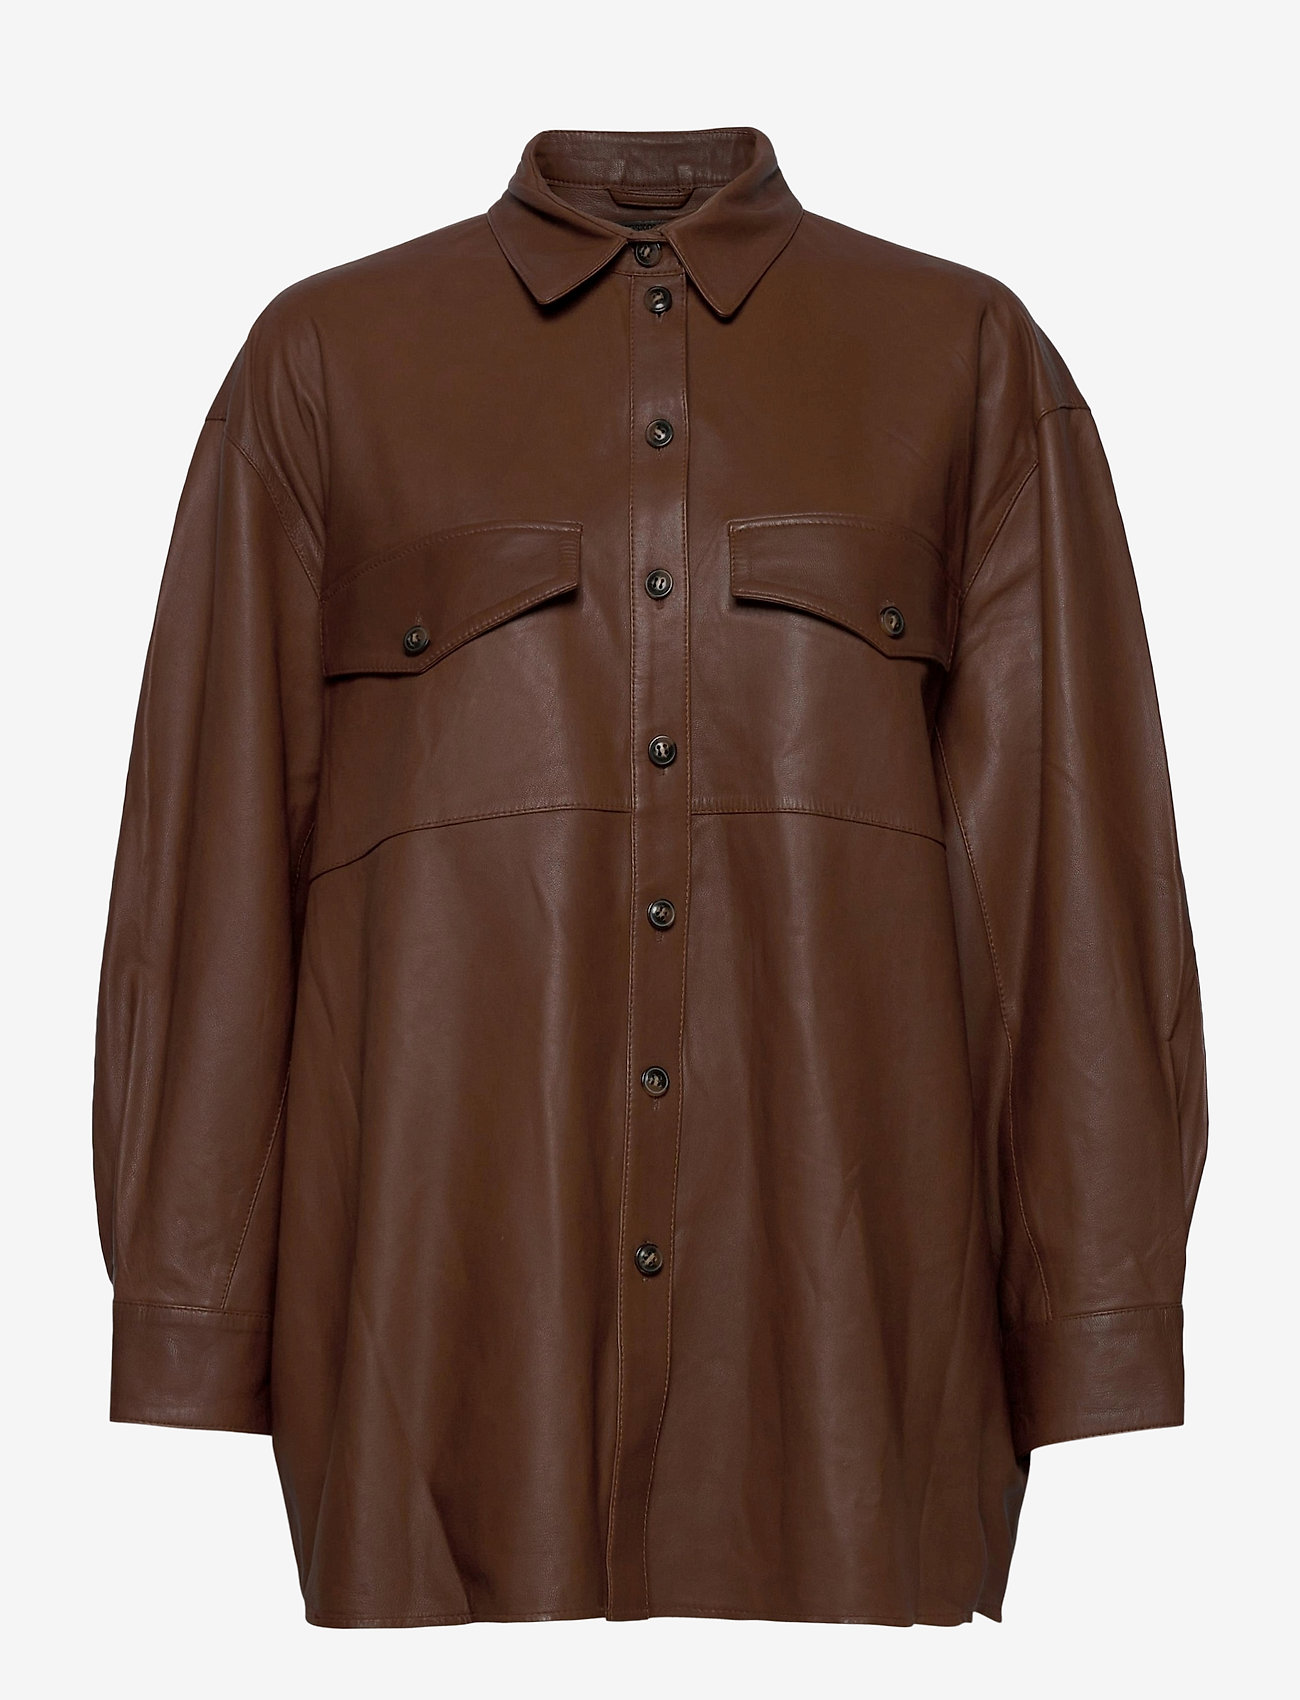 MDK / Munderingskompagniet - Agnes thin leather shirt - overshirts - monks robe - 0